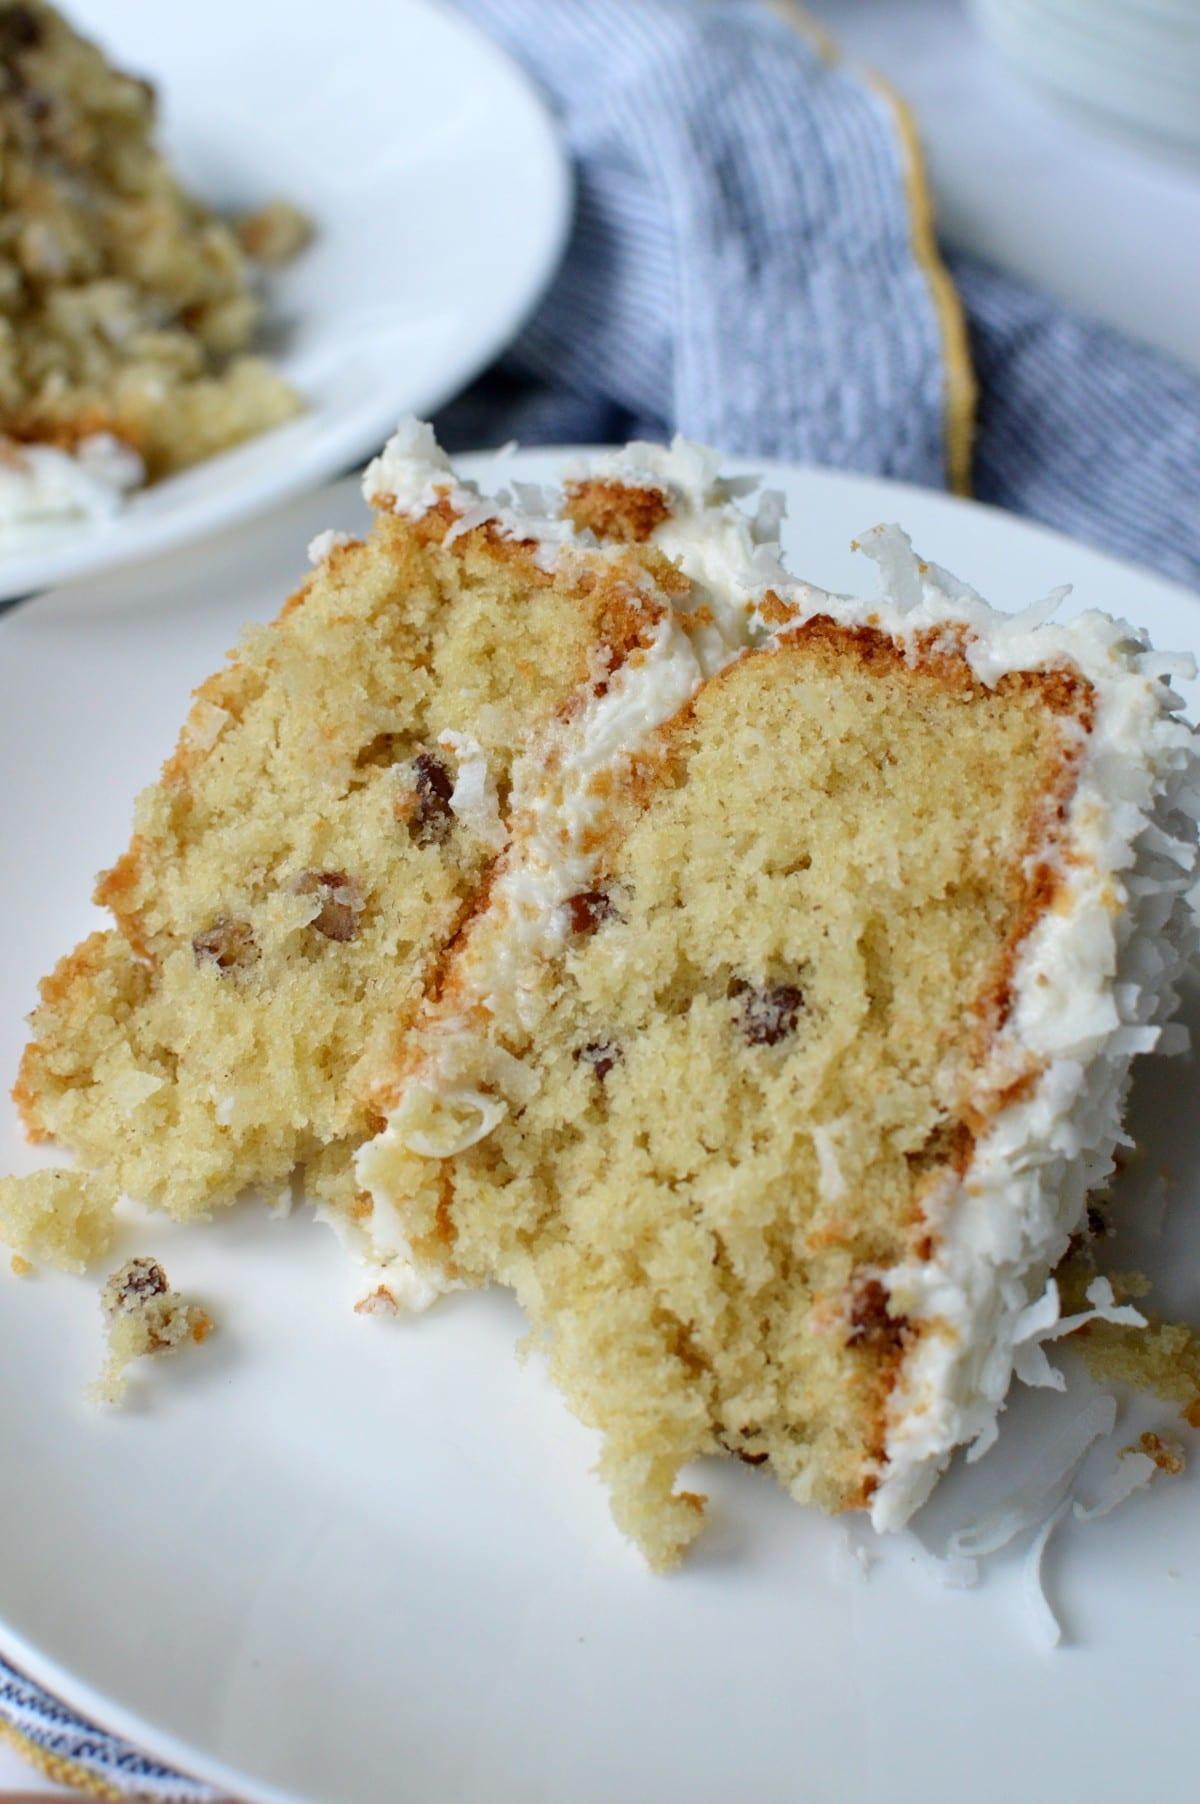 A slice of gluten free cake